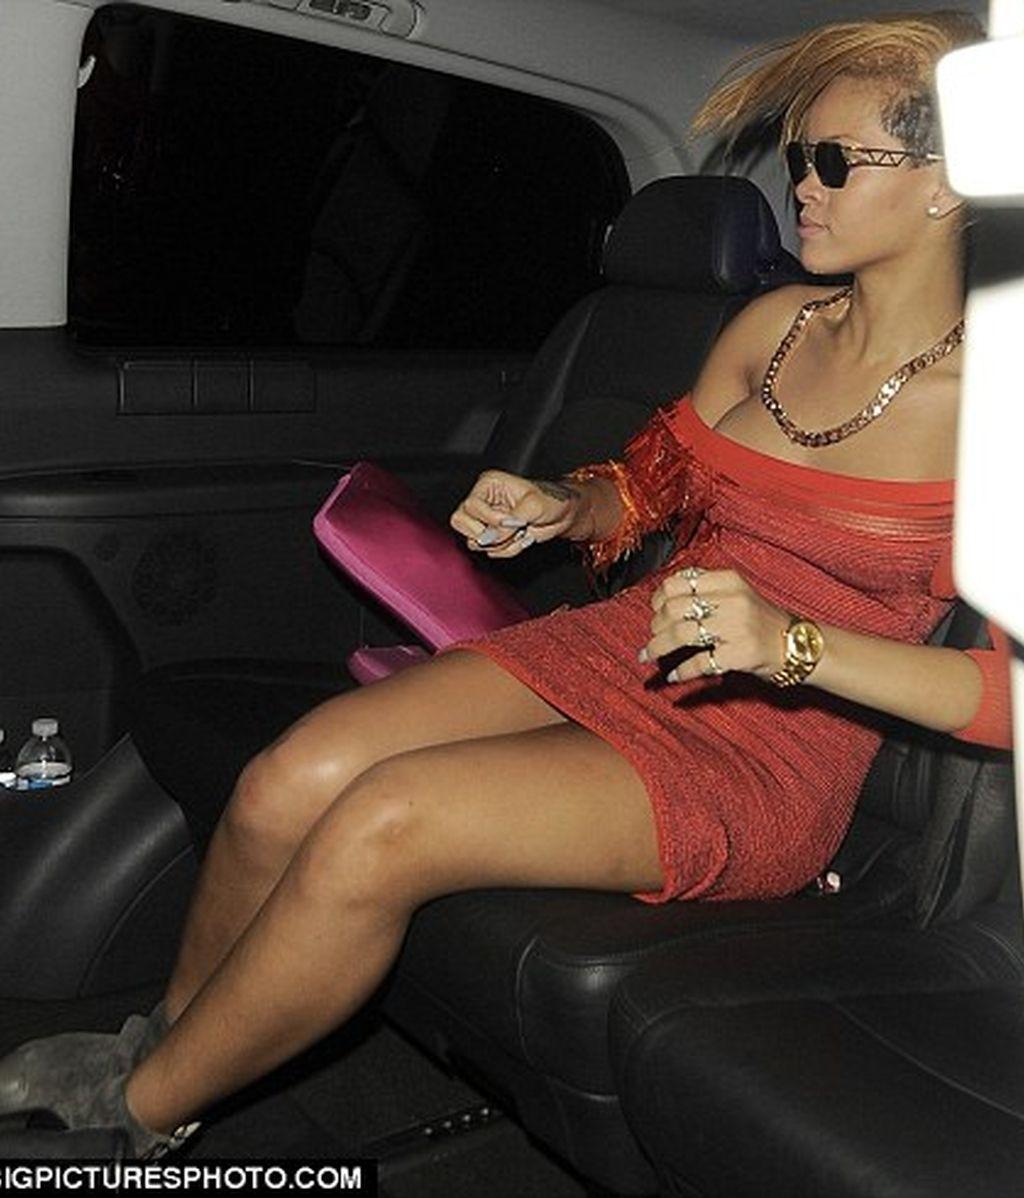 Hasta Rihanna tiene celulitis